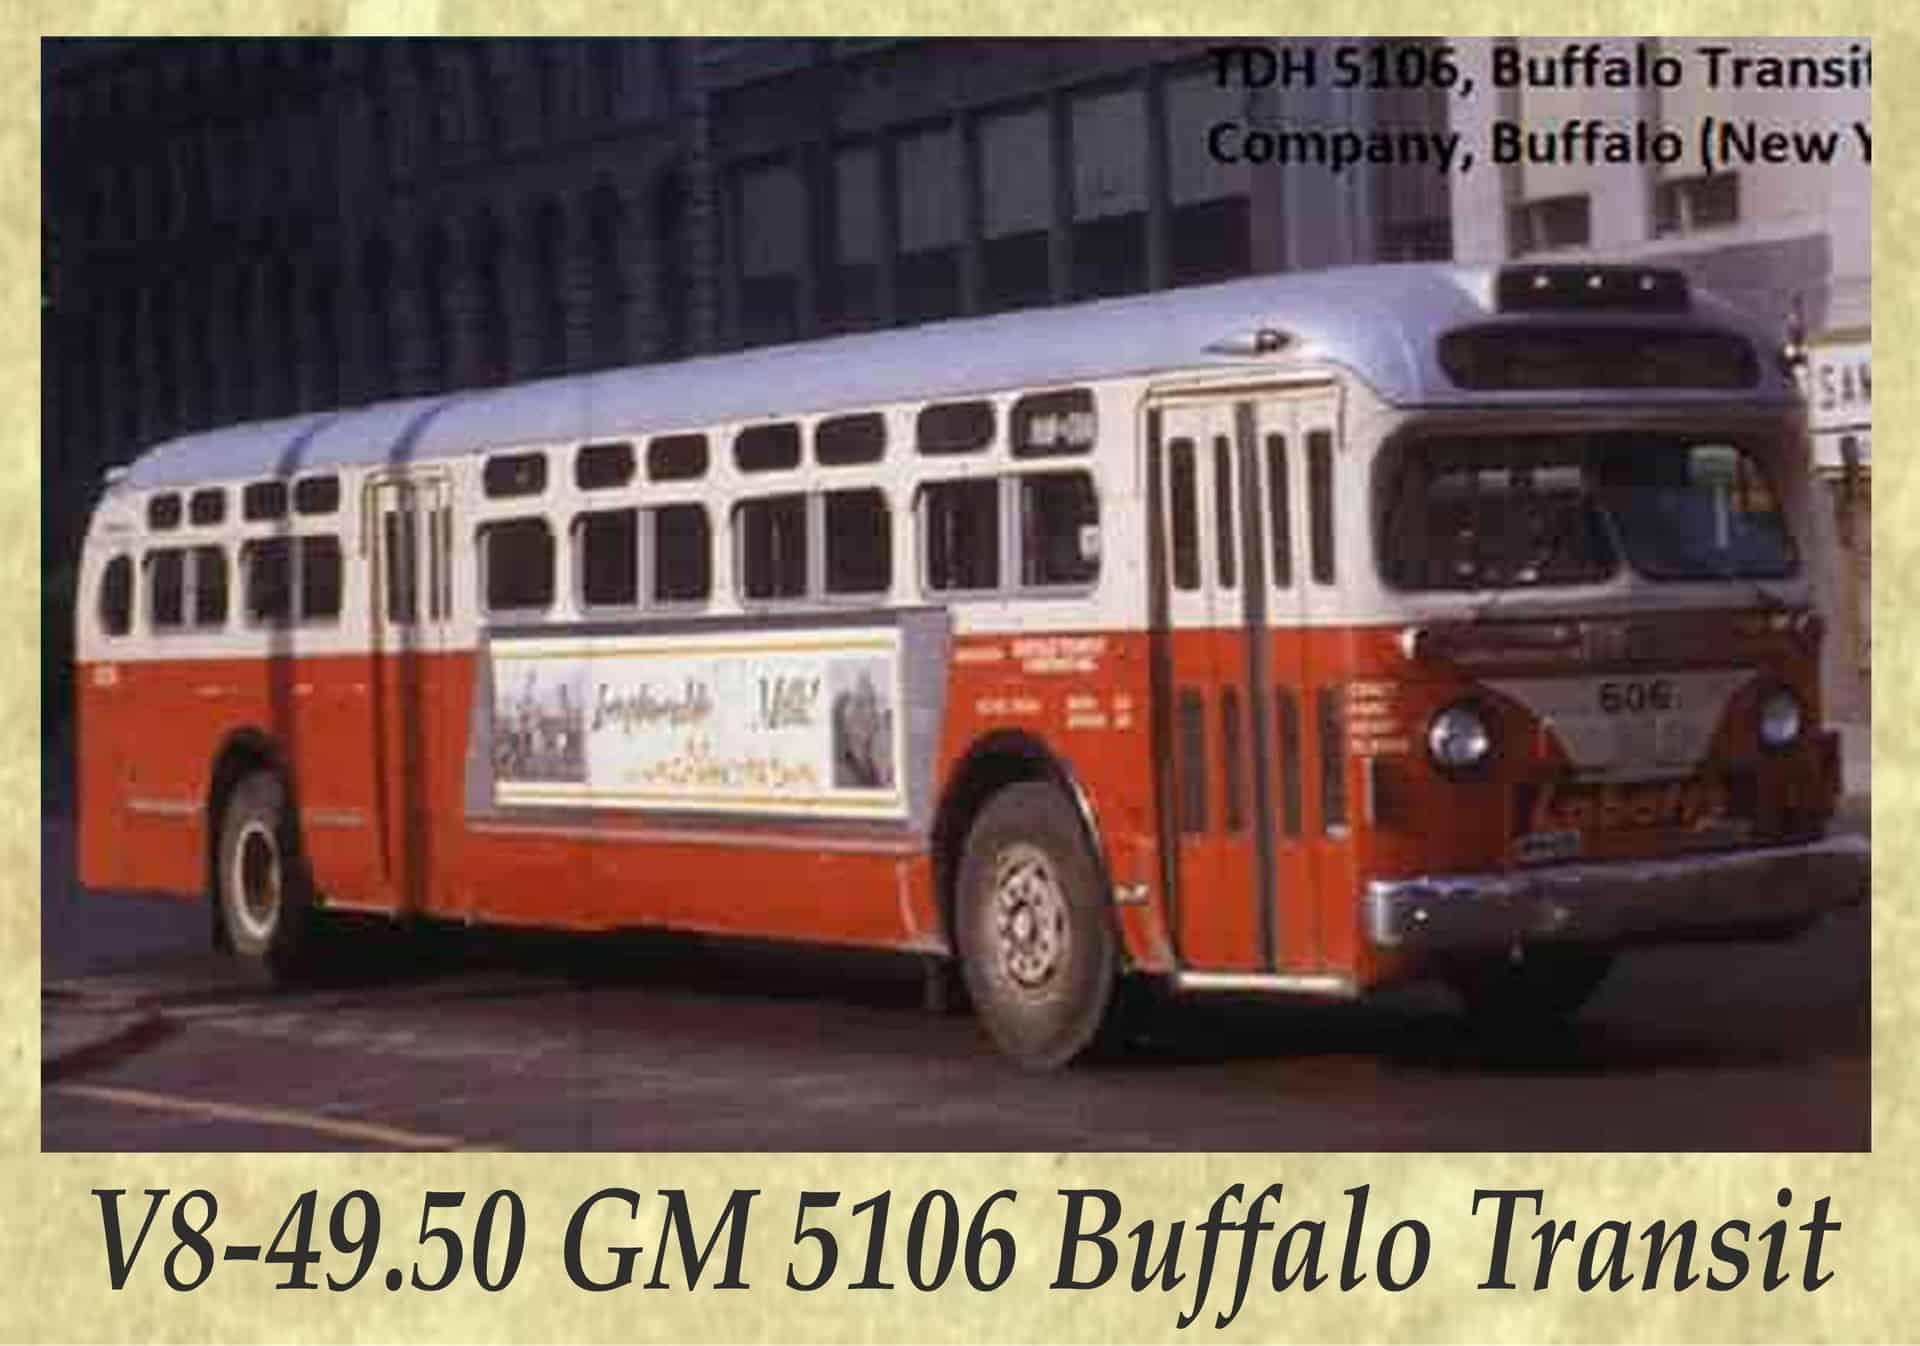 V8-49.50 GM 5106 Buffalo Transit